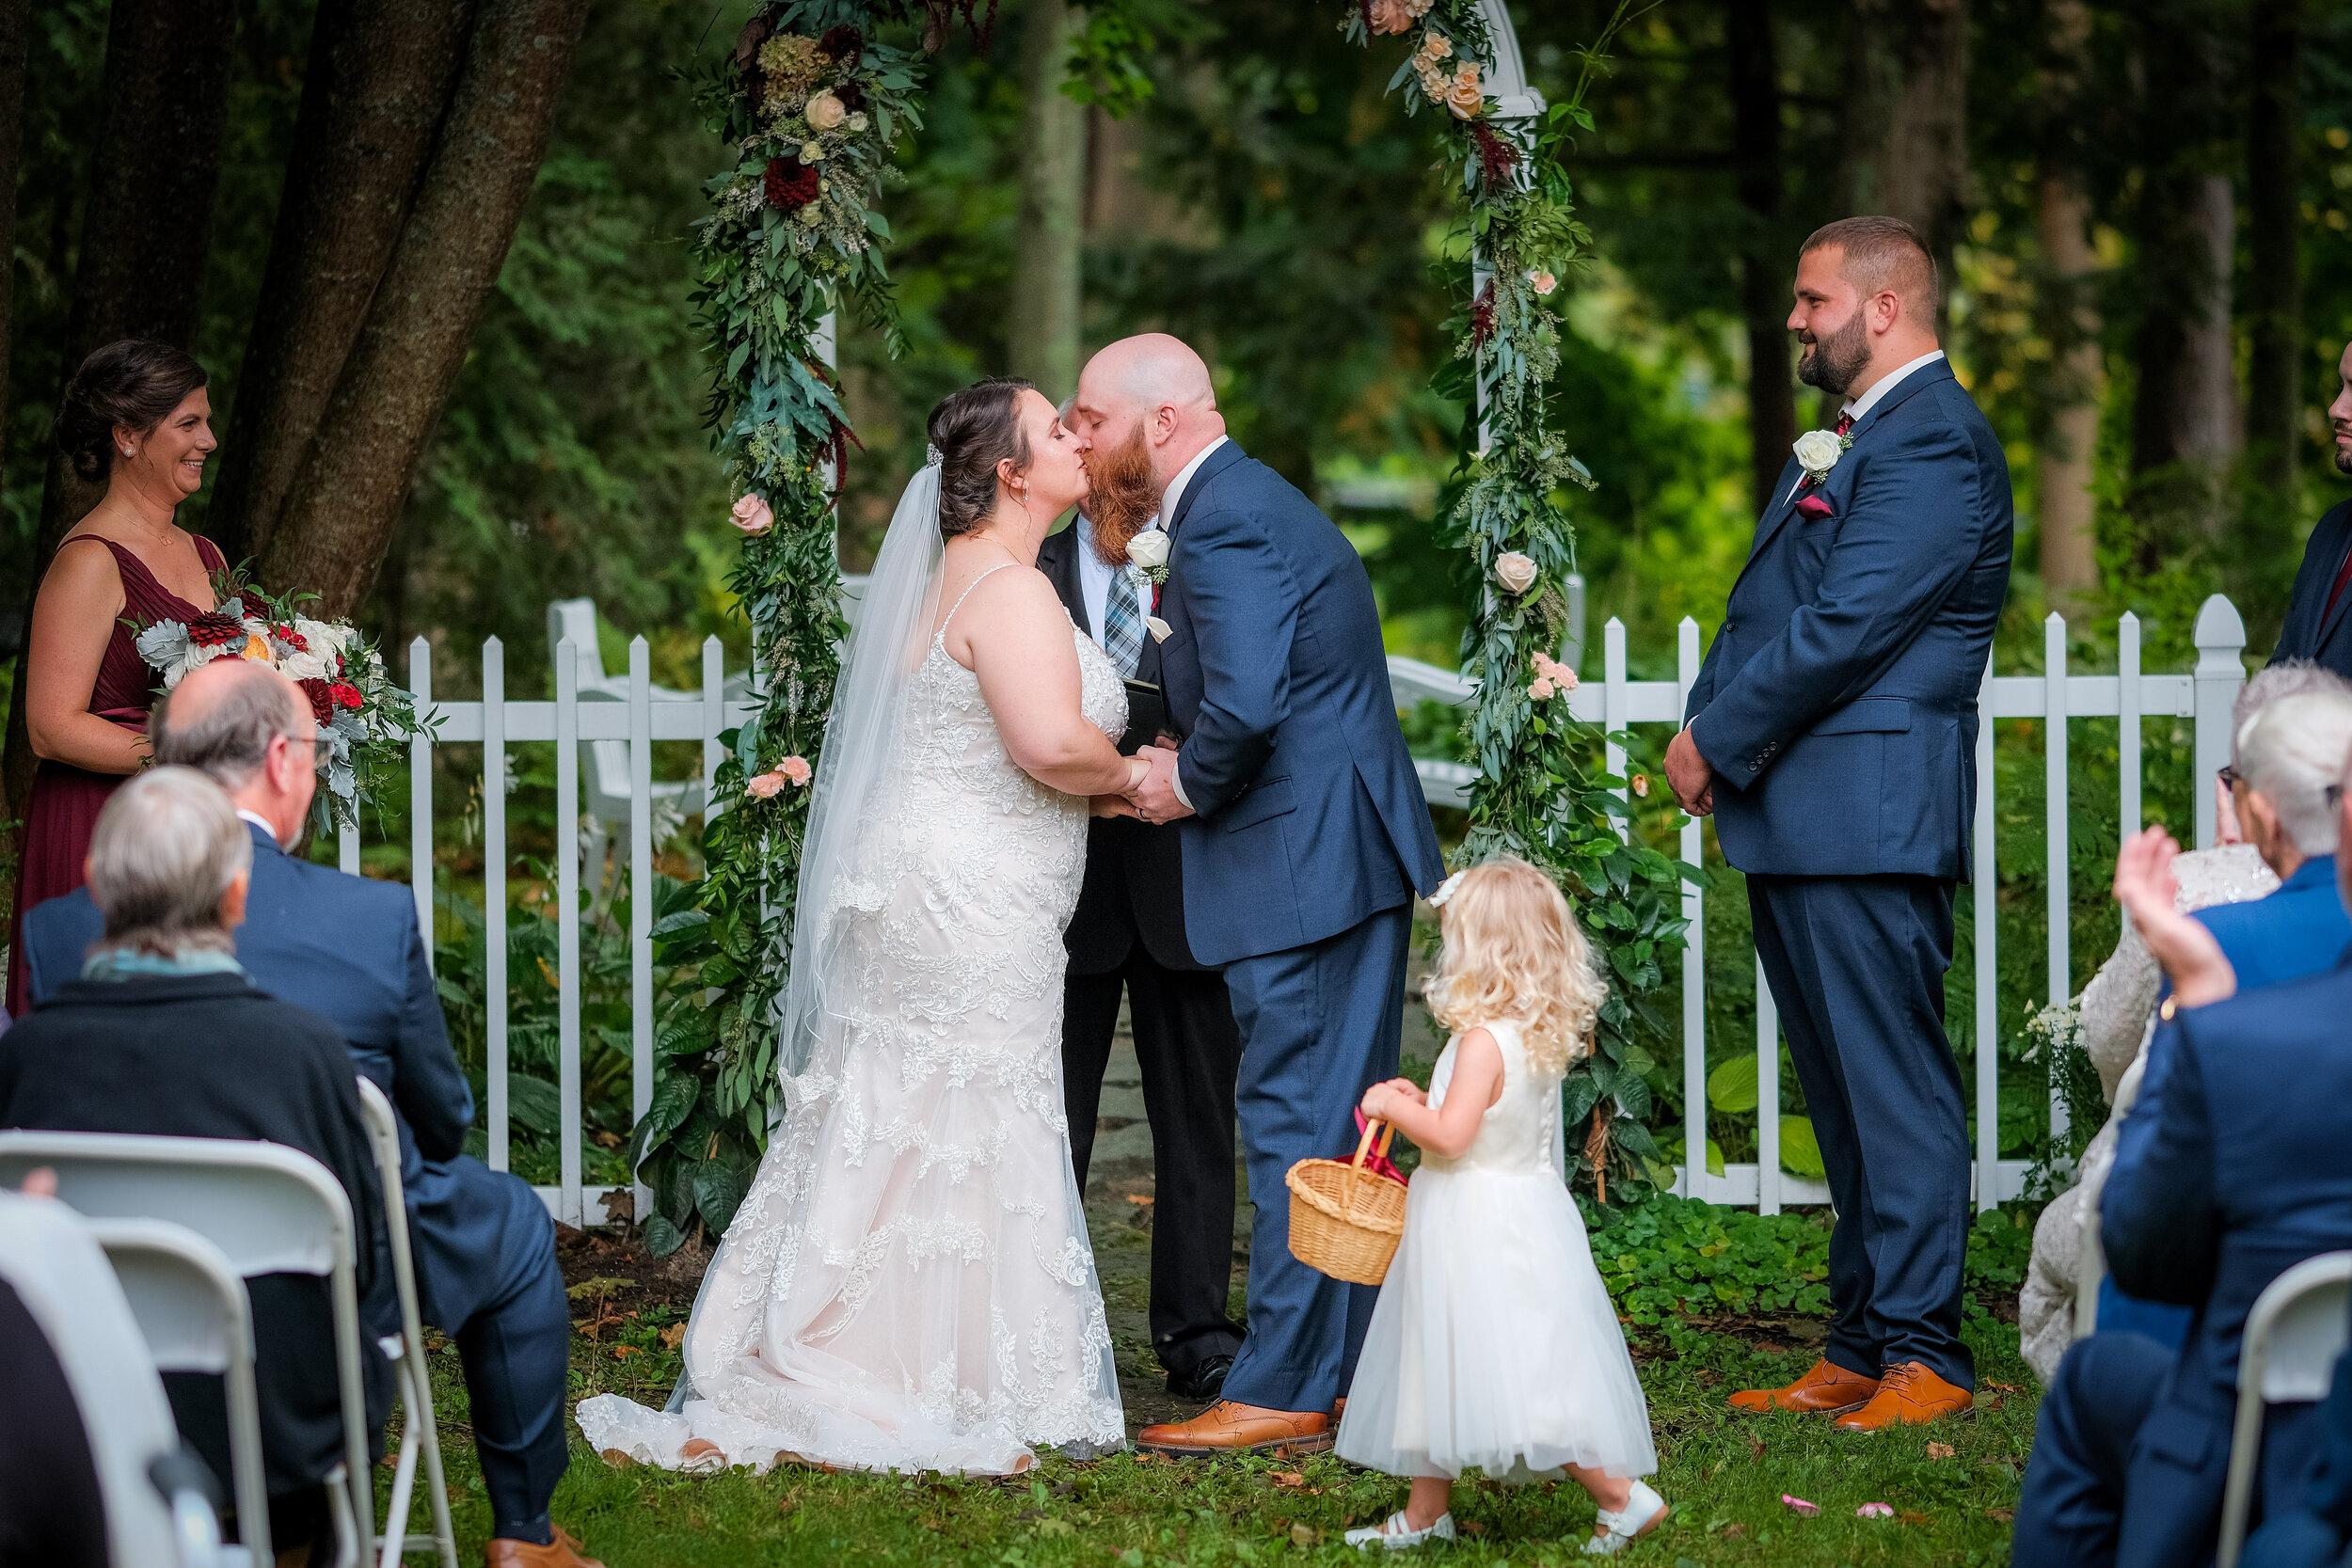 three-chimneys-inn-wedding-photography-656.jpg